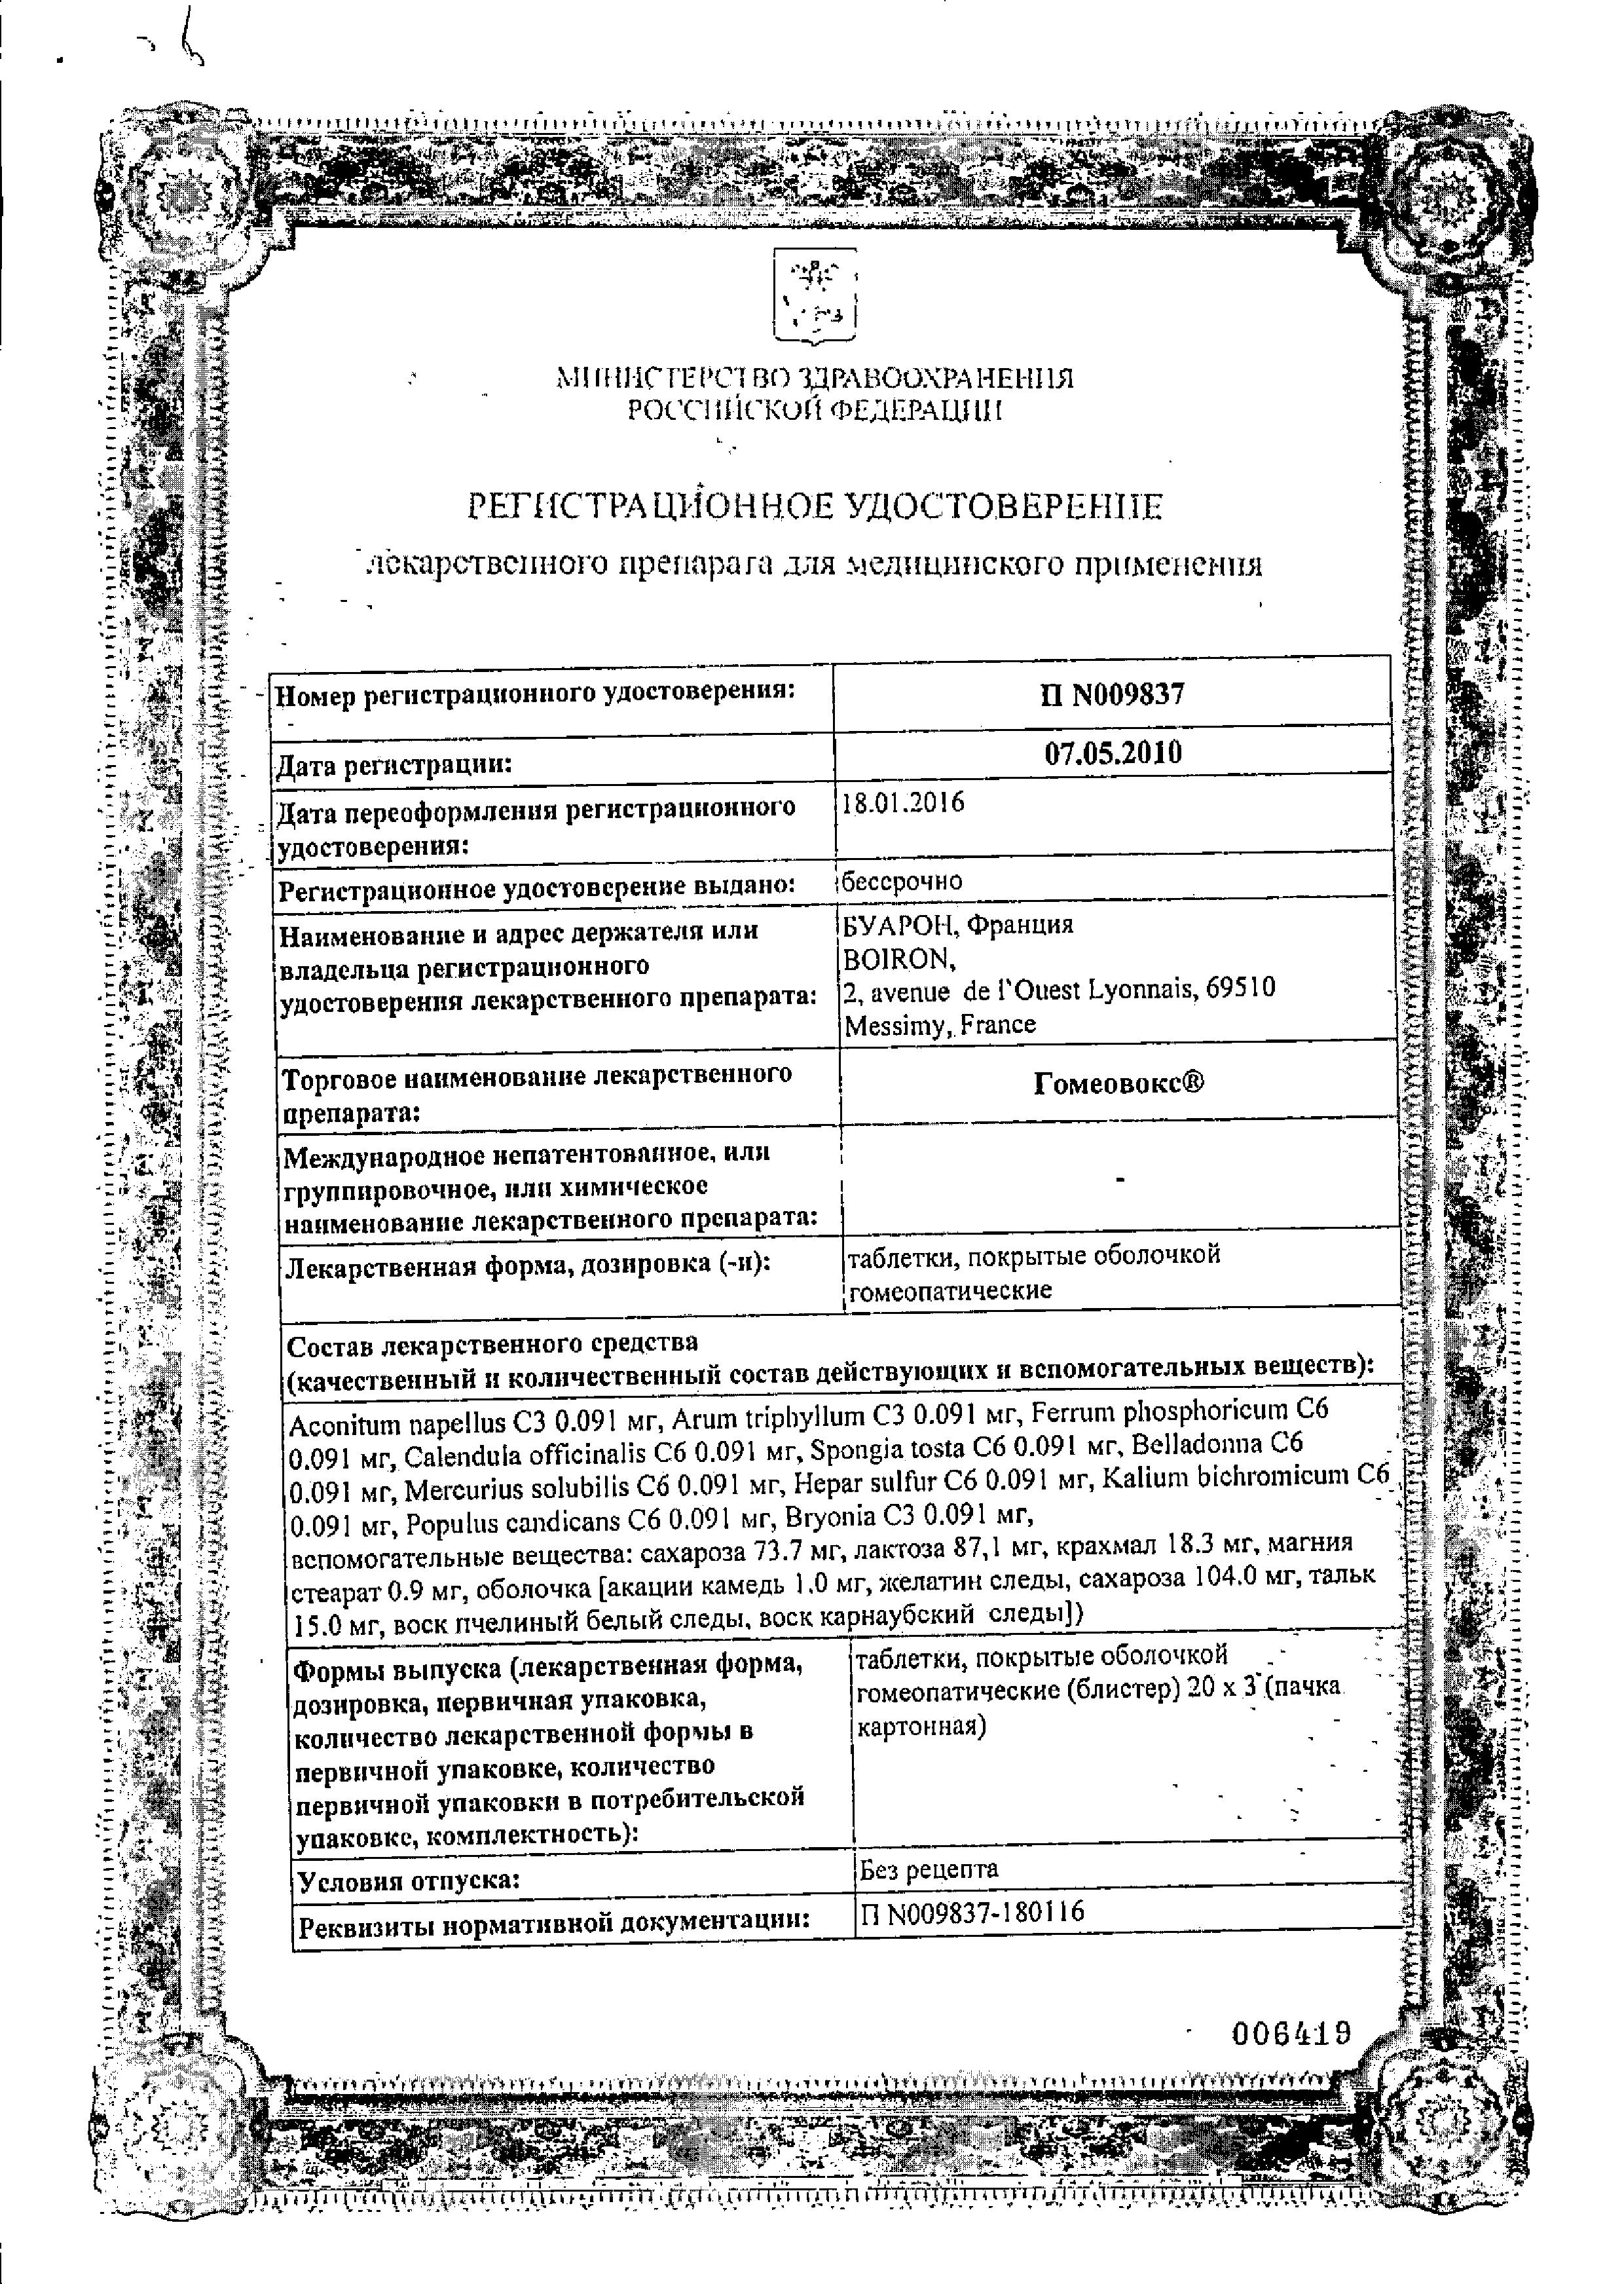 Гомеовокс сертификат